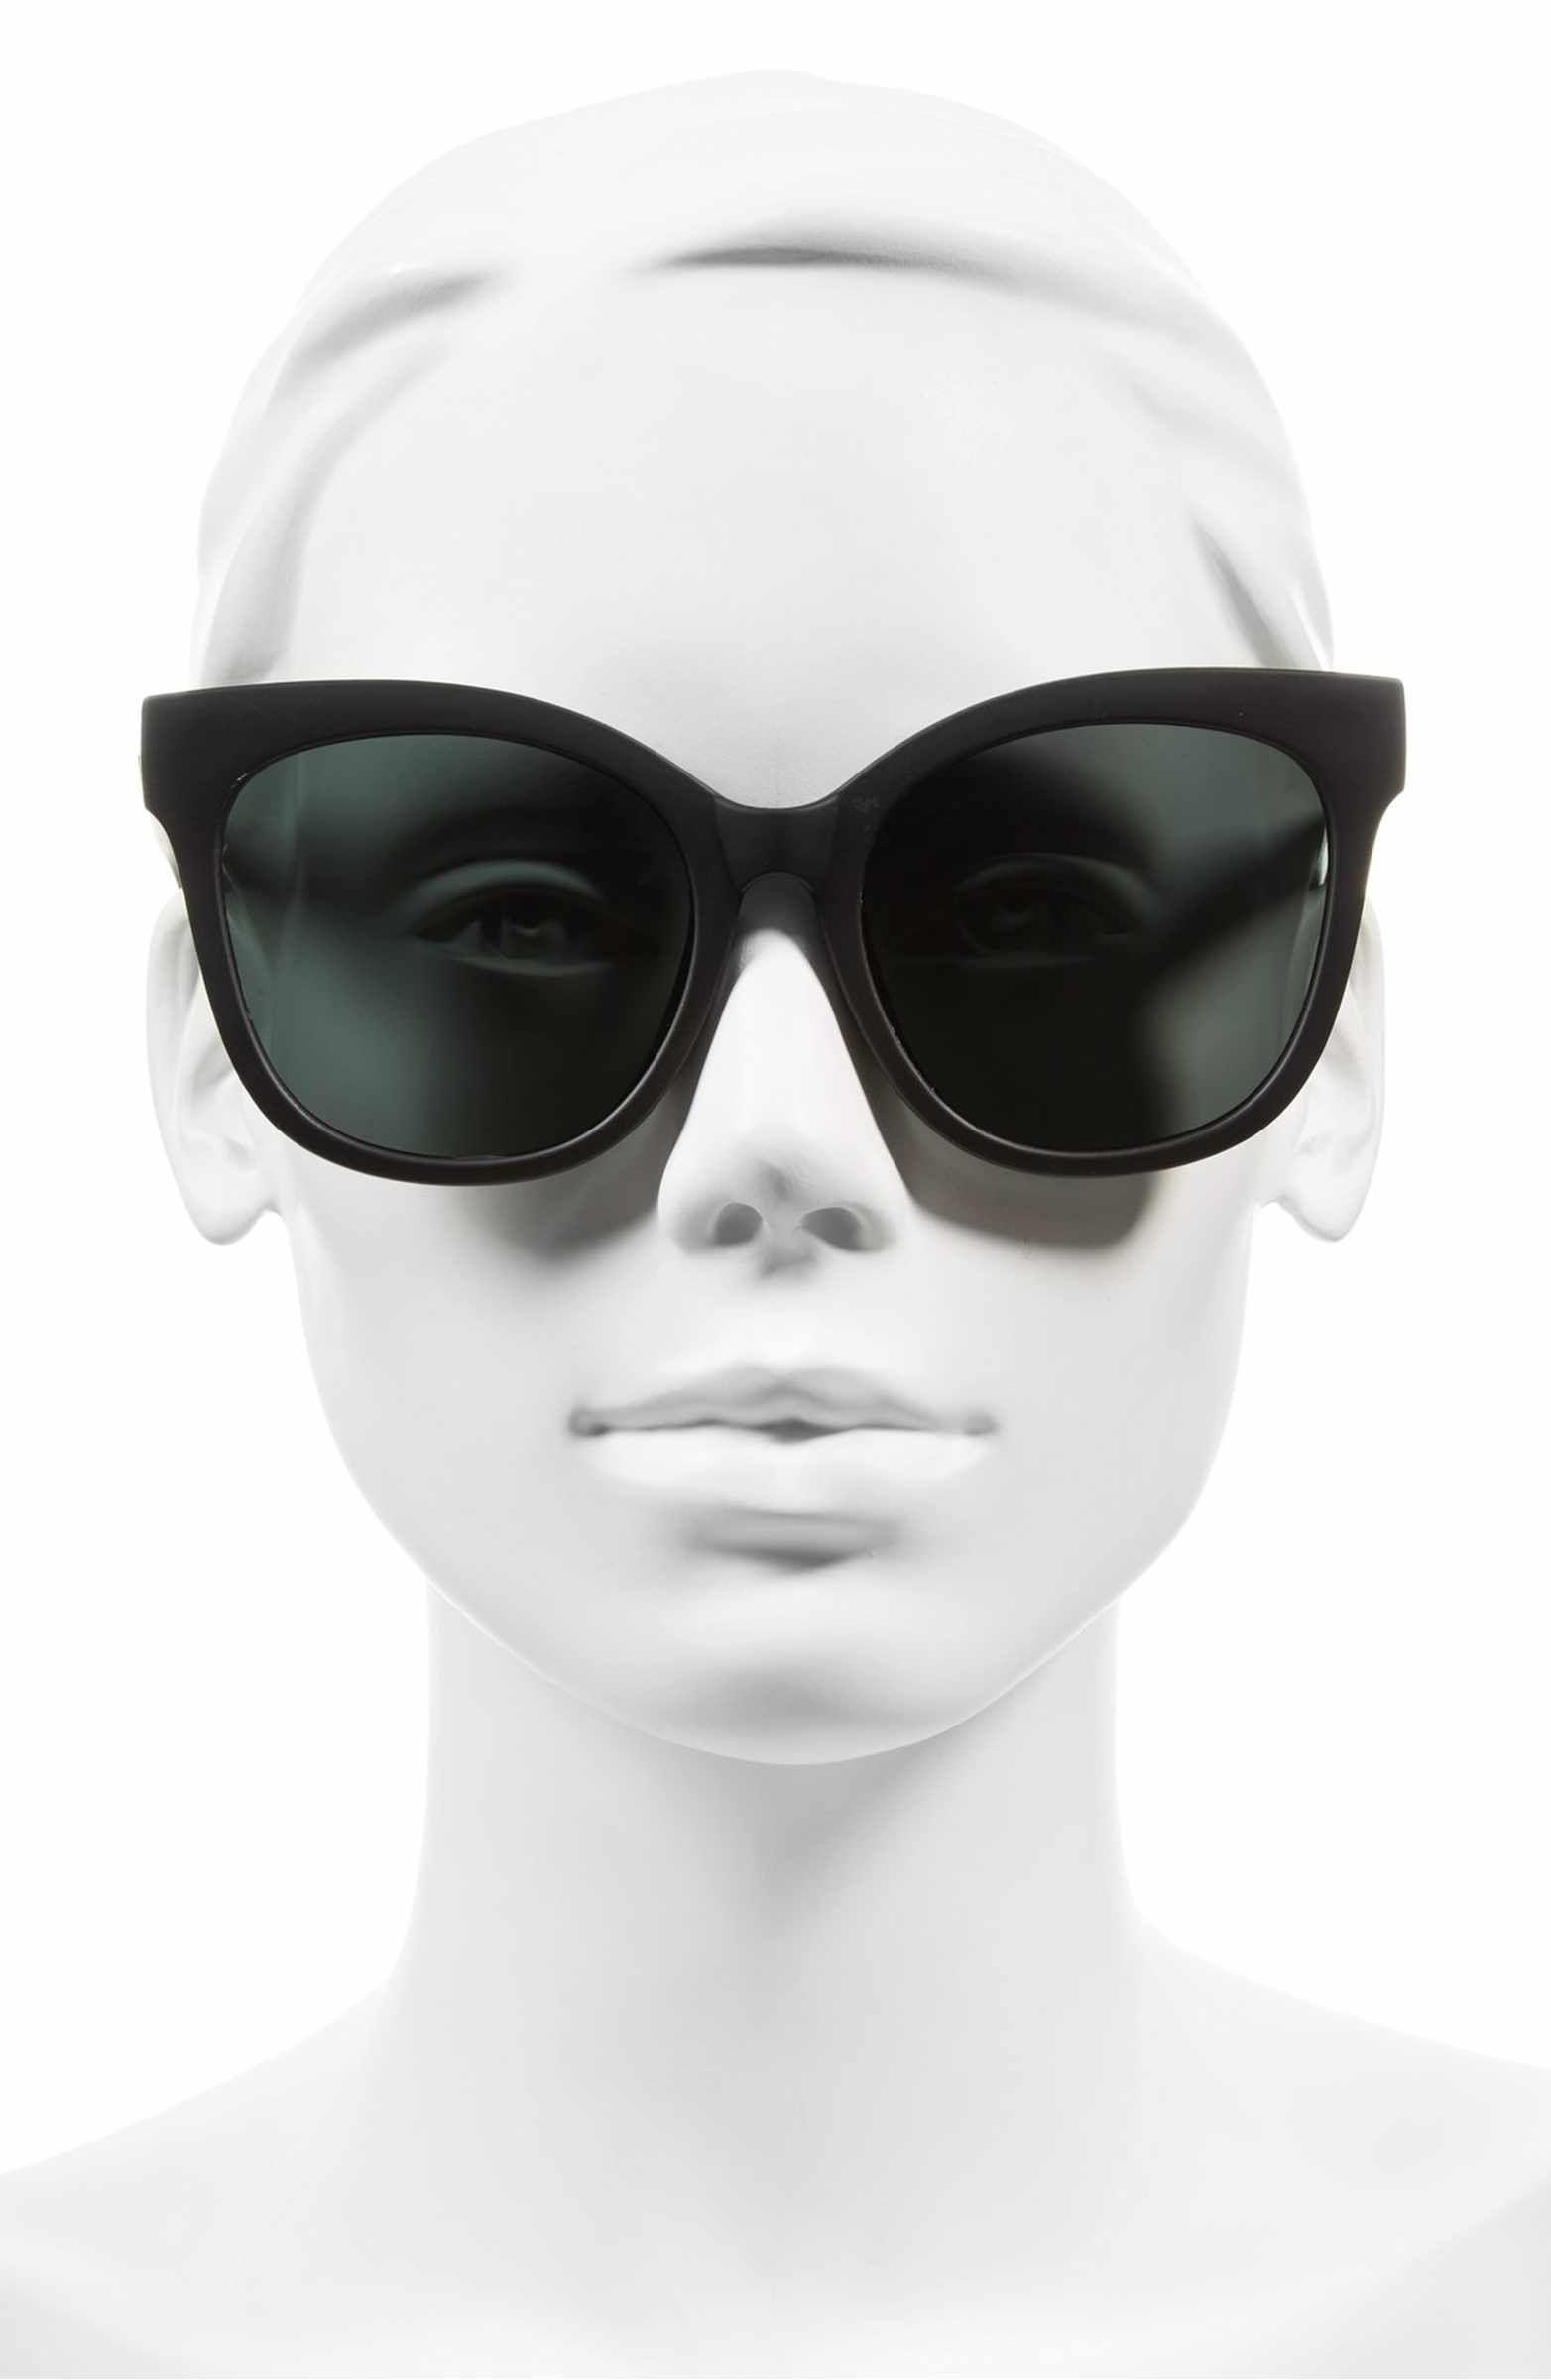 e452691d87 Main Image - Quay Australia It s My Way 55mm Sunglasses